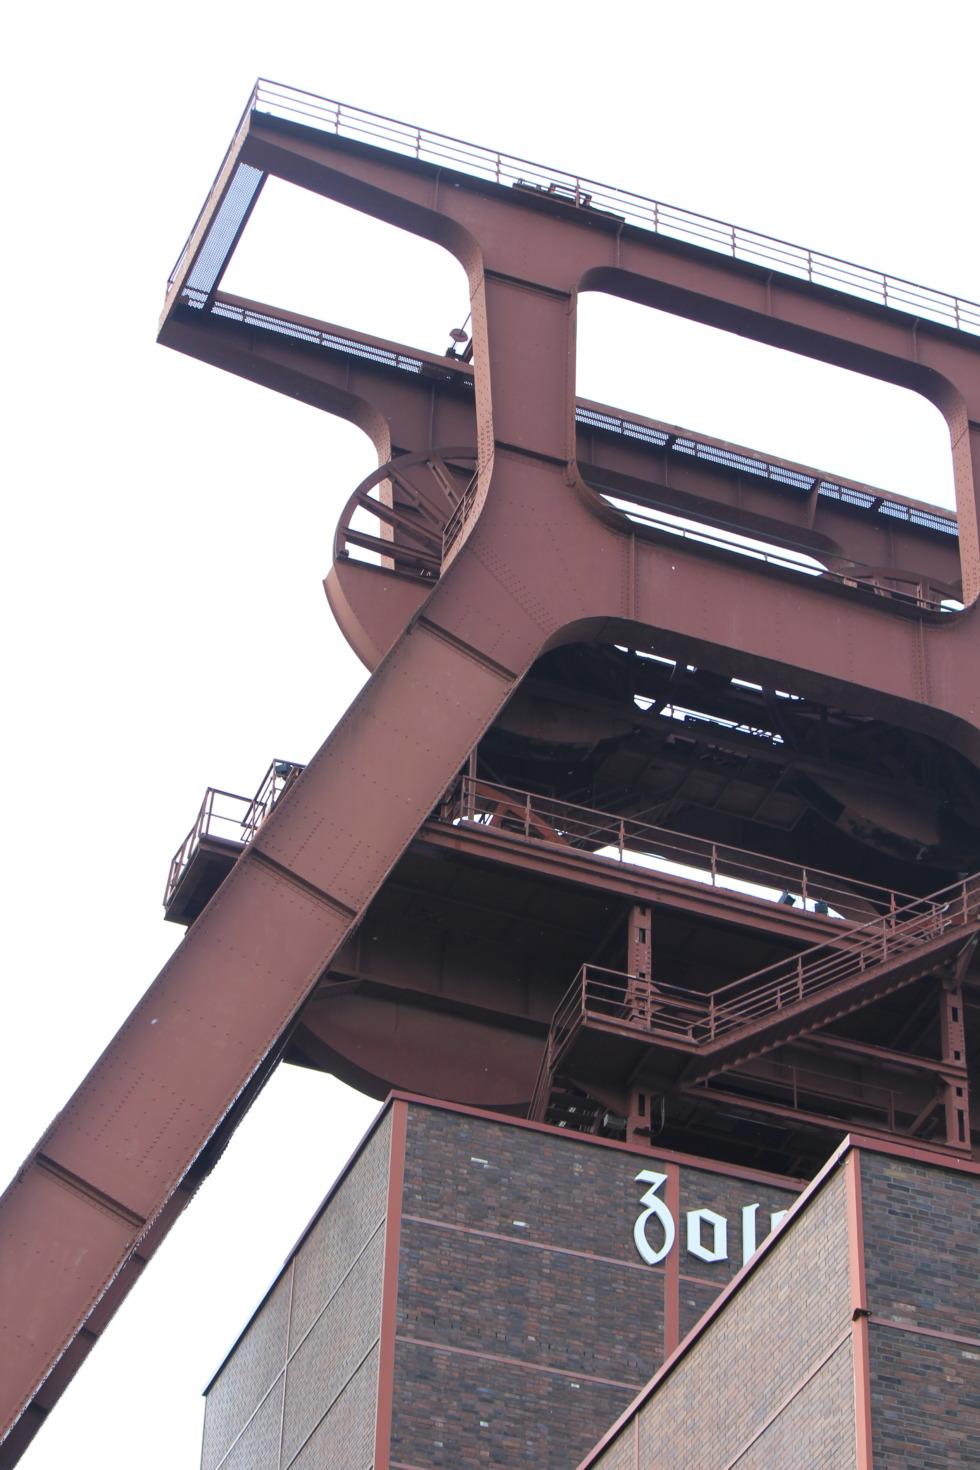 Huge headframe at Zeche Zollverein, Essen